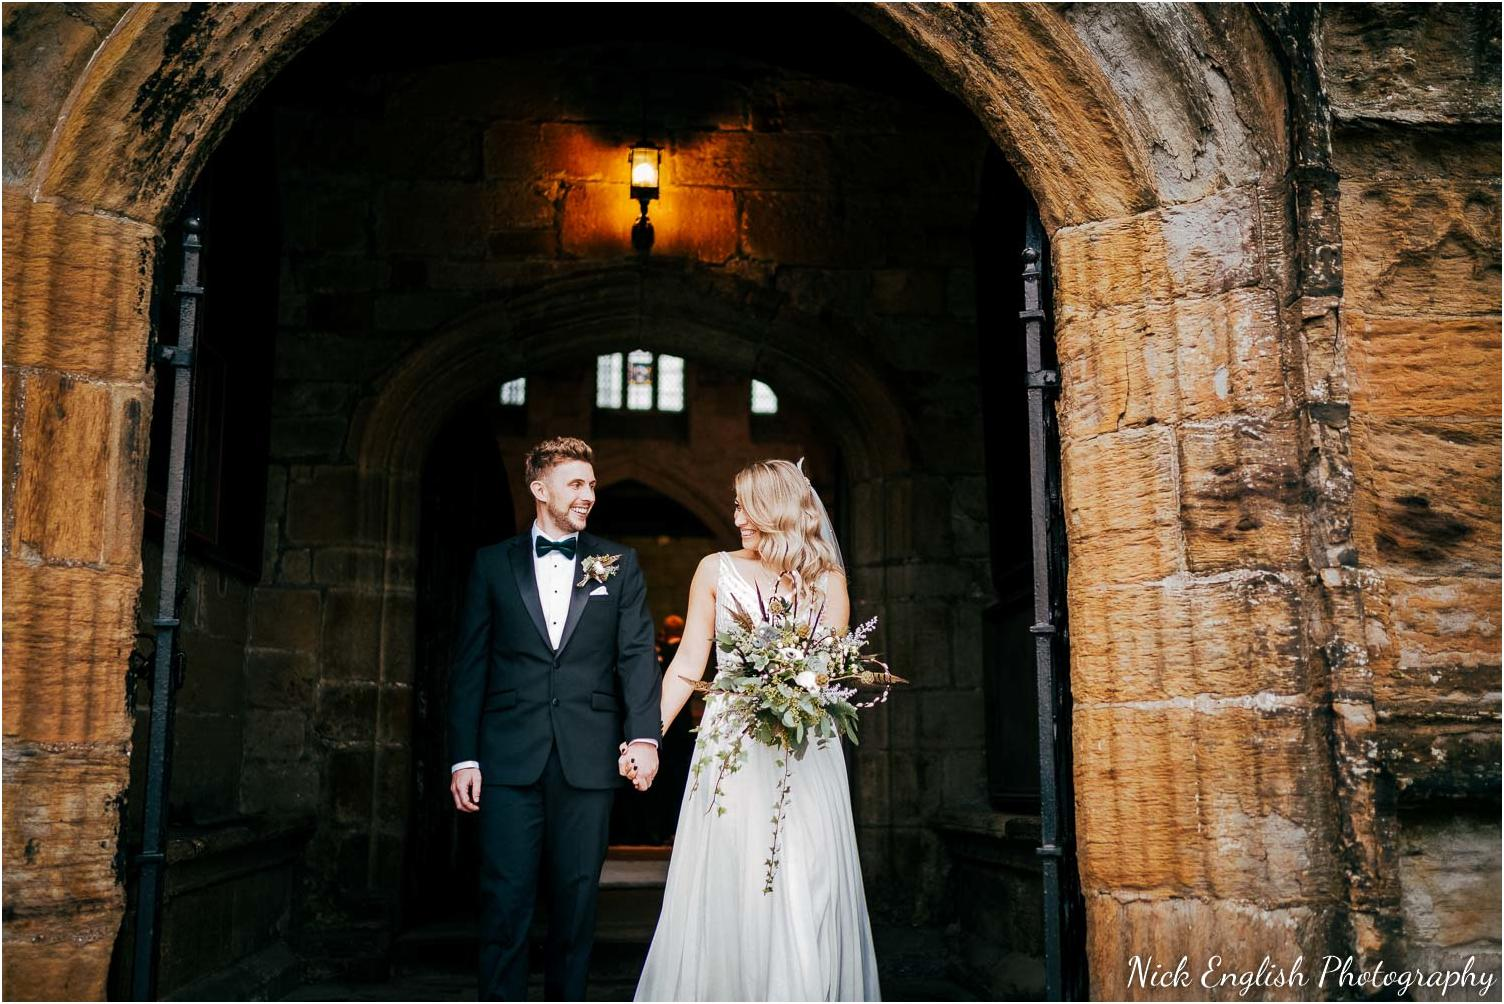 Mitton_Hall_Christmas_Winter_Wedding-37.jpg